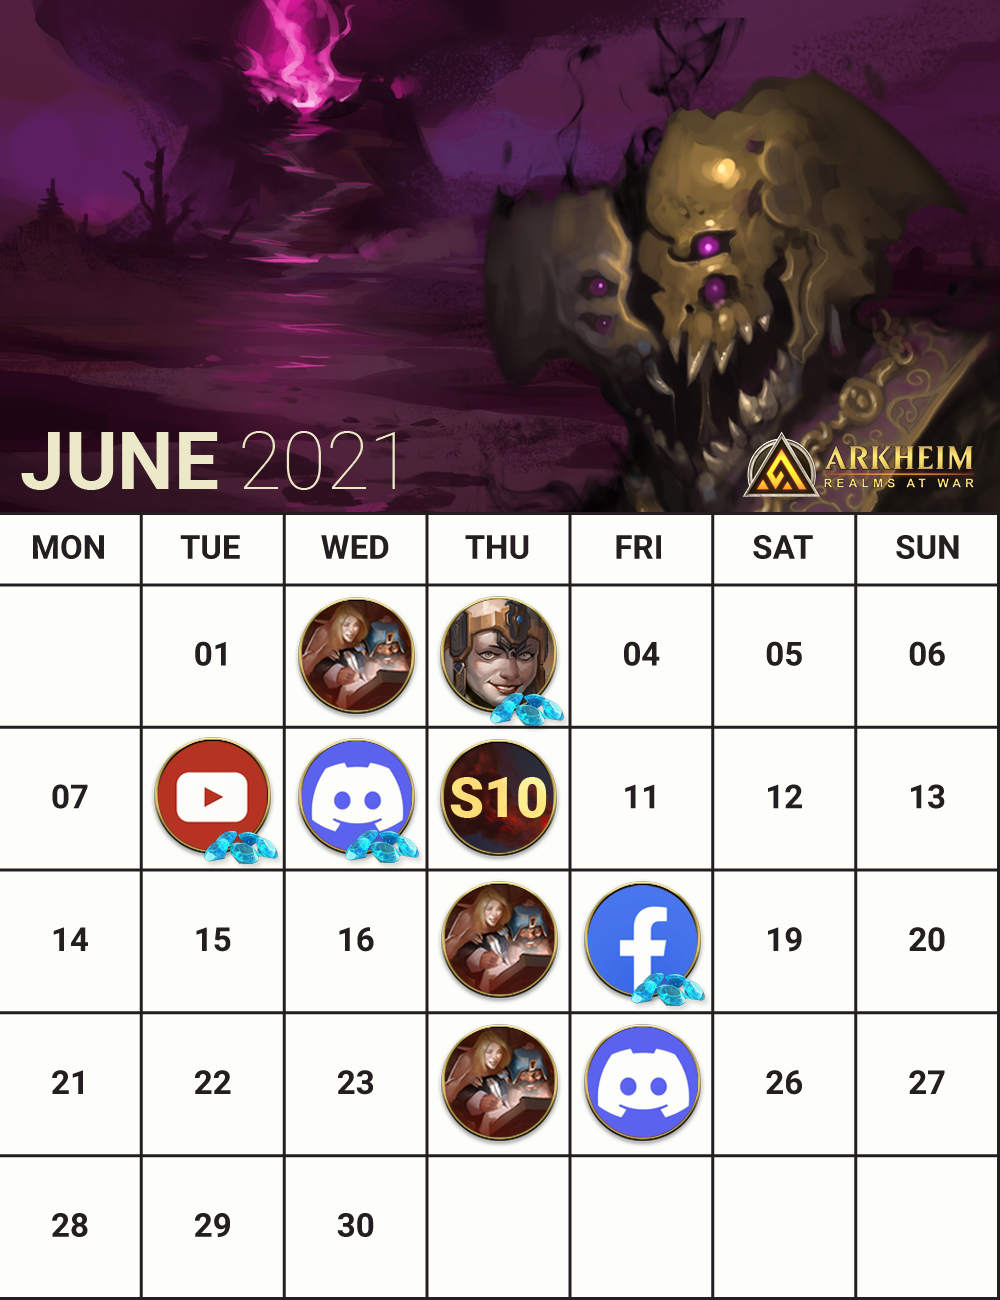 1614-community-calendar-june-2021-png